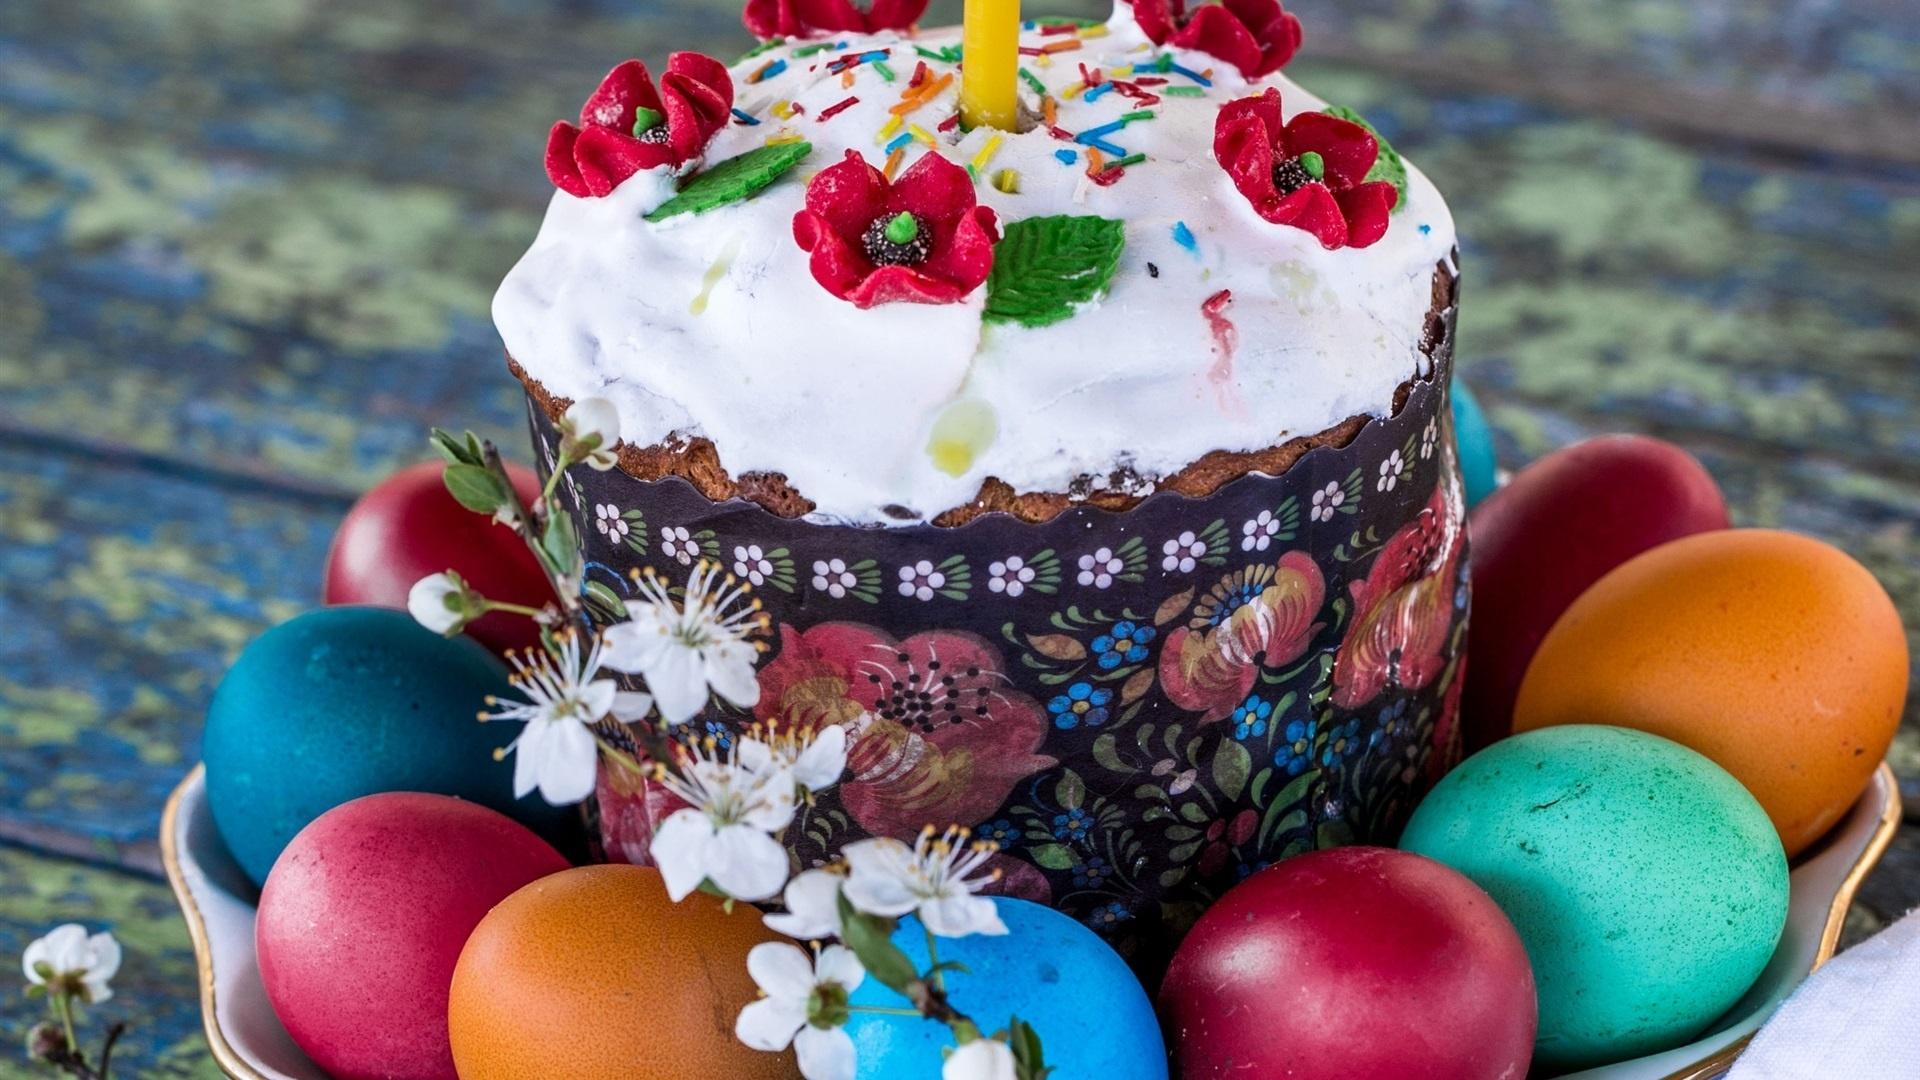 Easter Cake Image